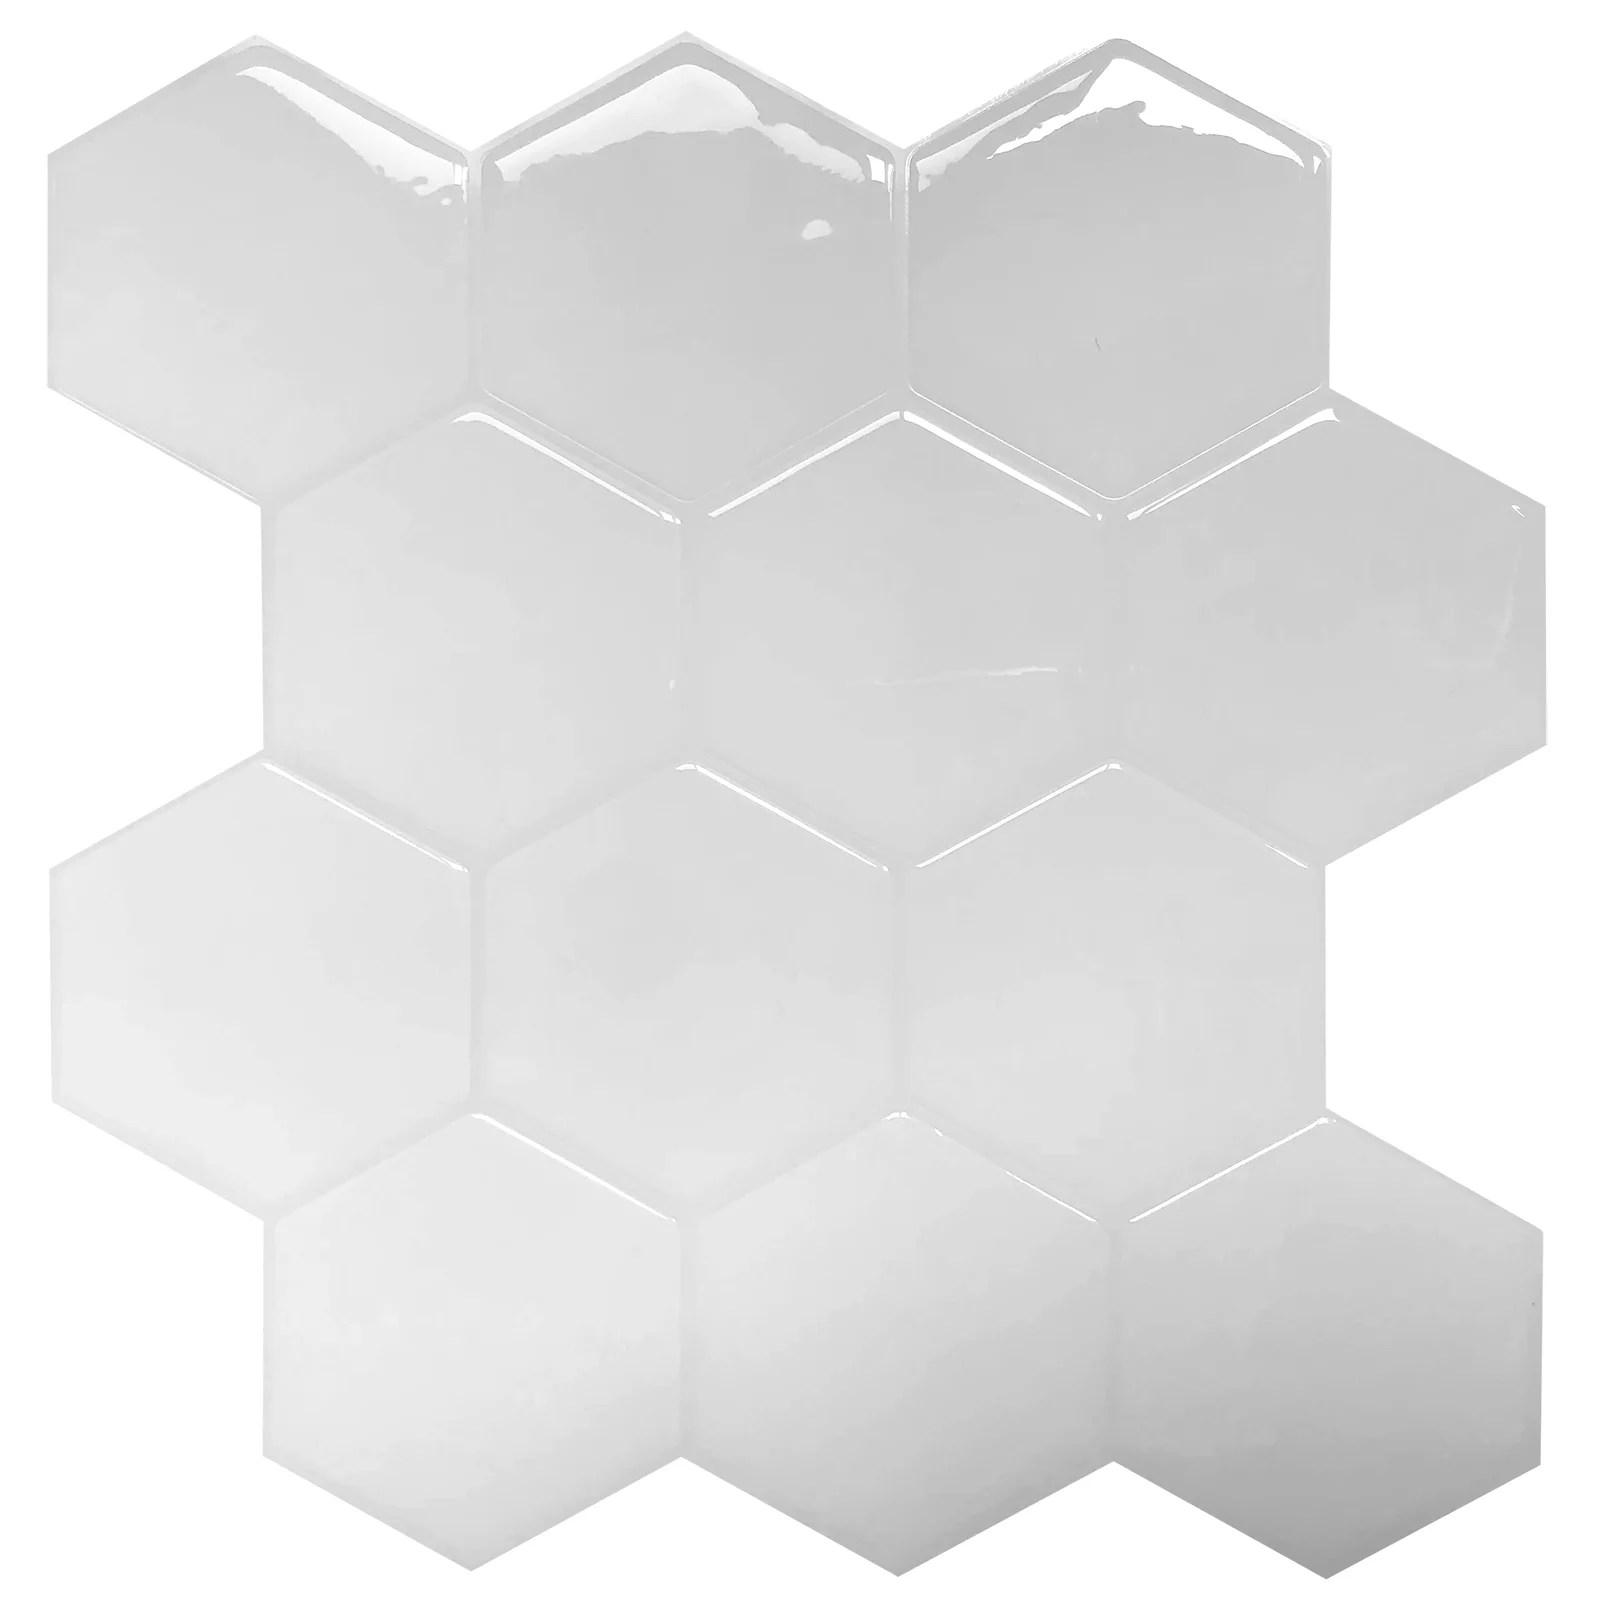 10 sheets peel and stick backsplash tiles self adhesive decorative tiles